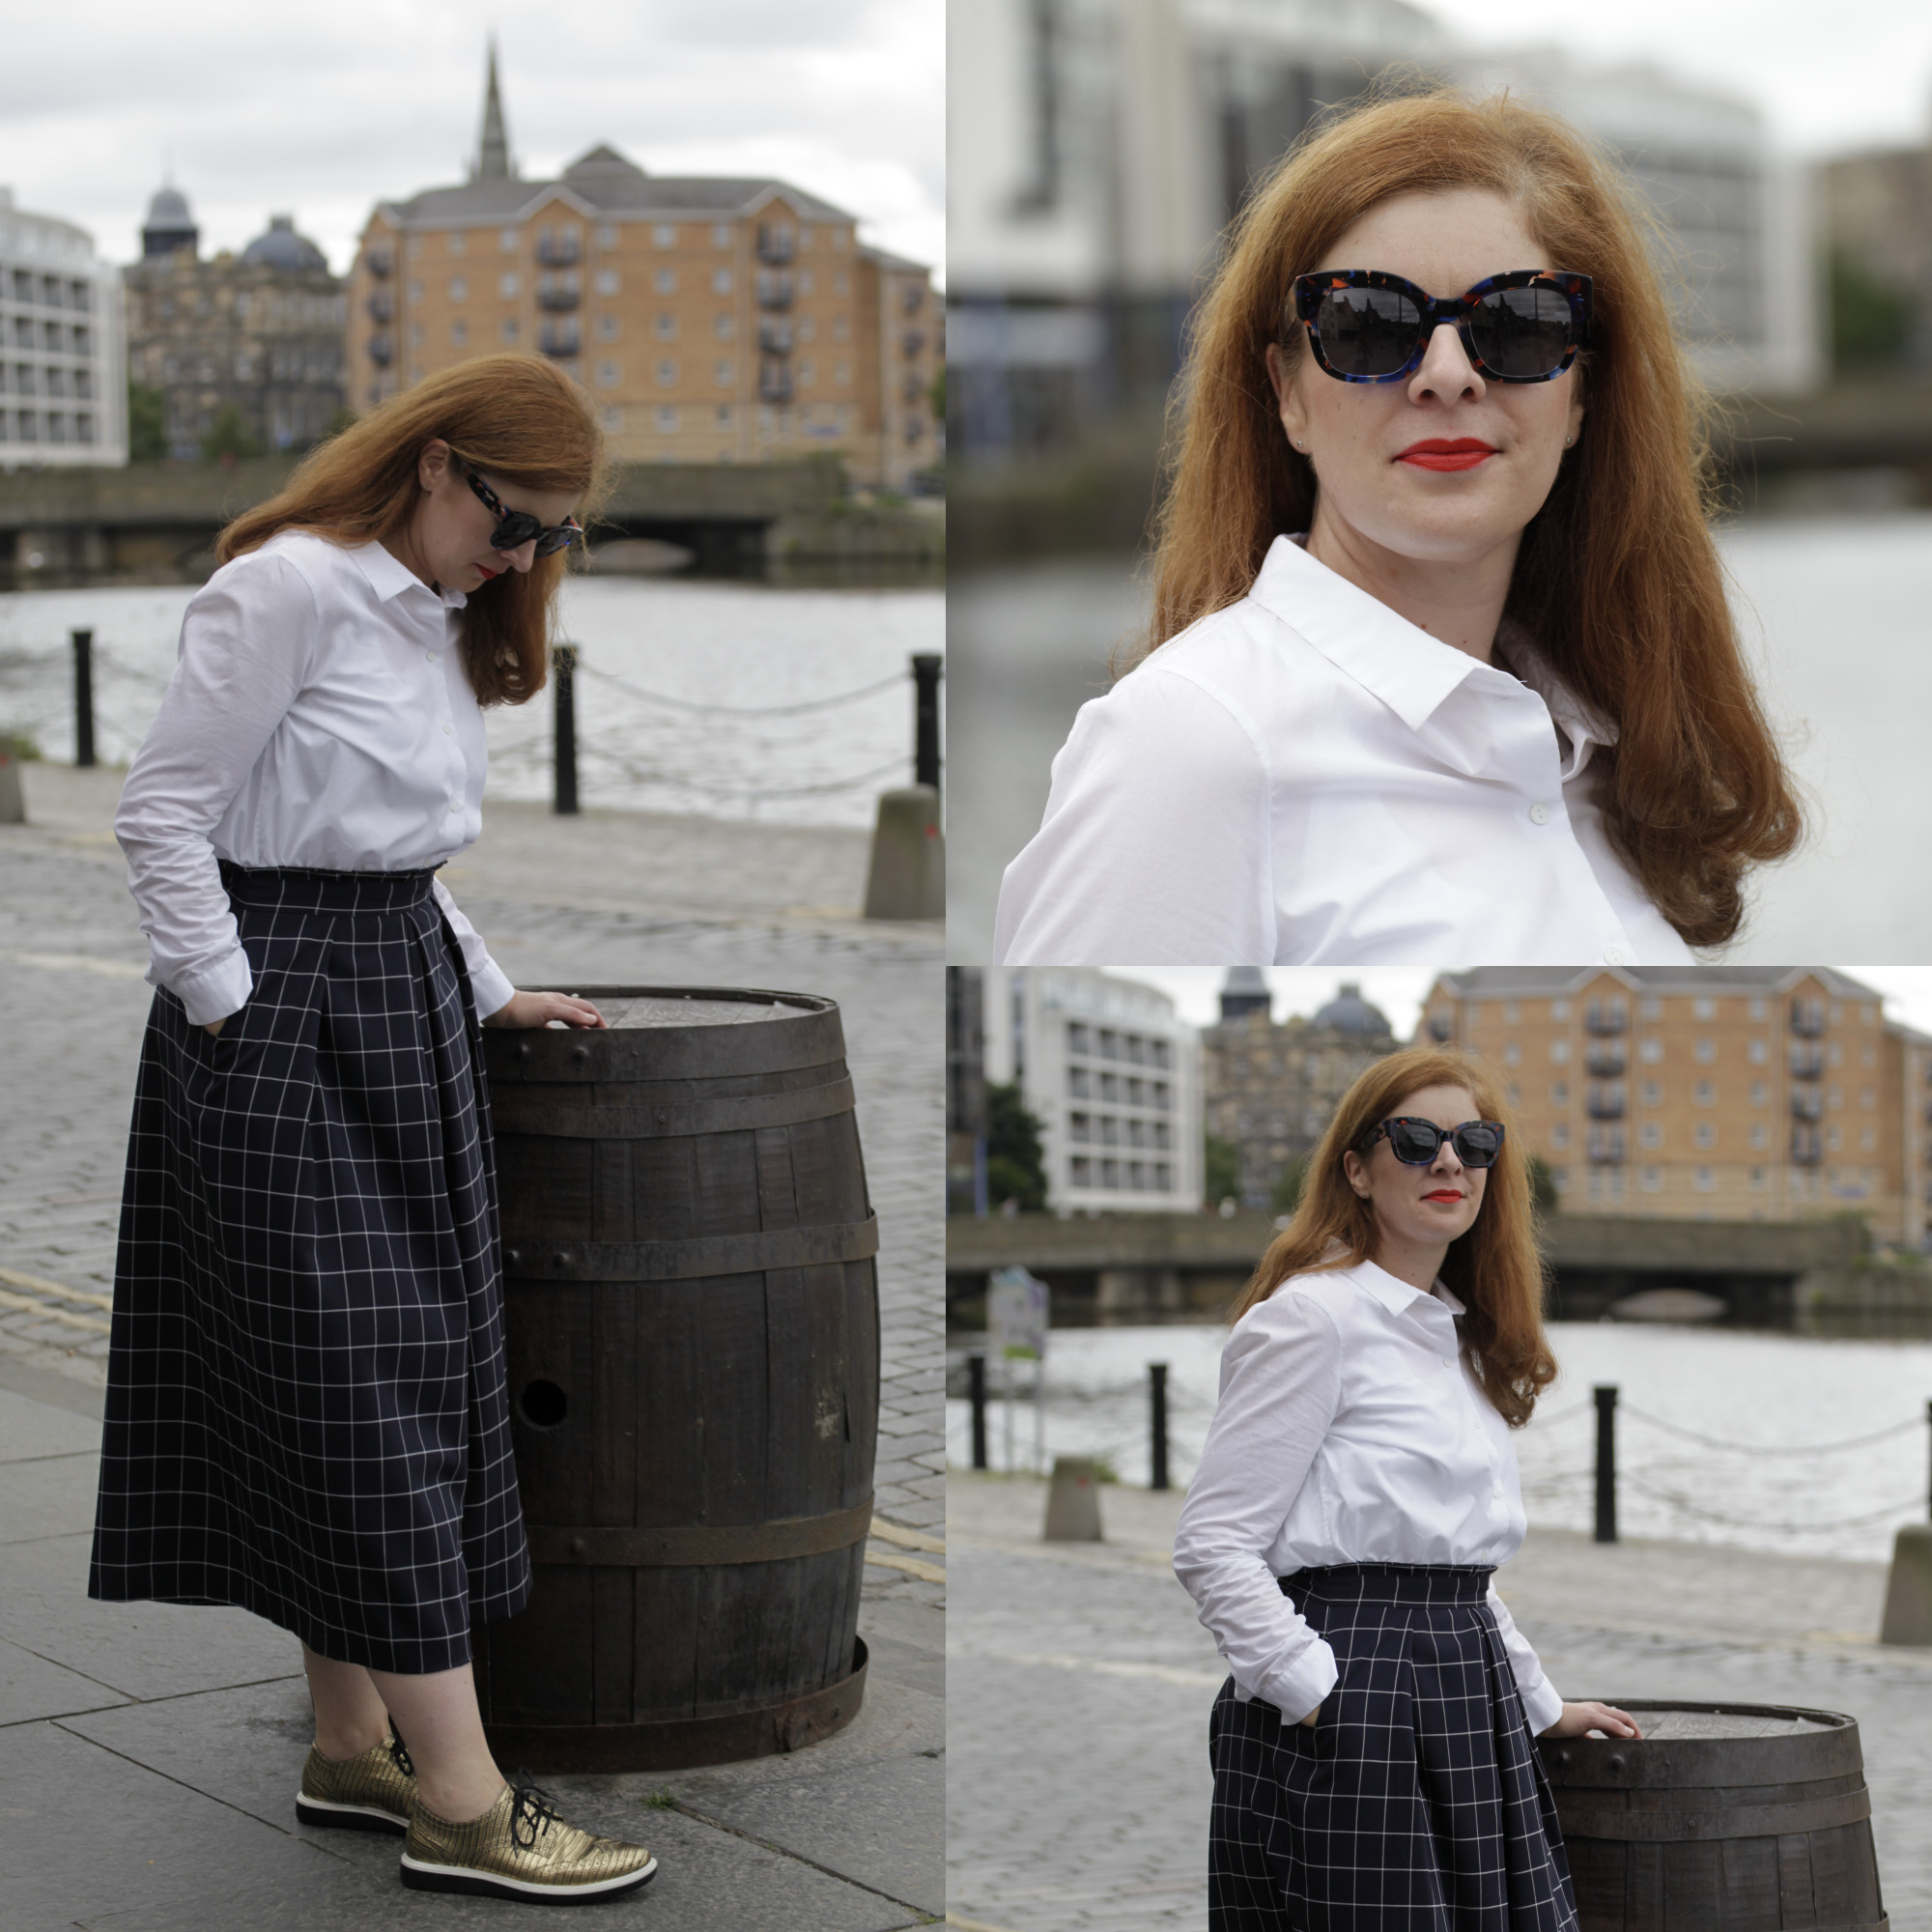 Herbst Culottes herbstlich Fashion Fashionblogger IKNMLO